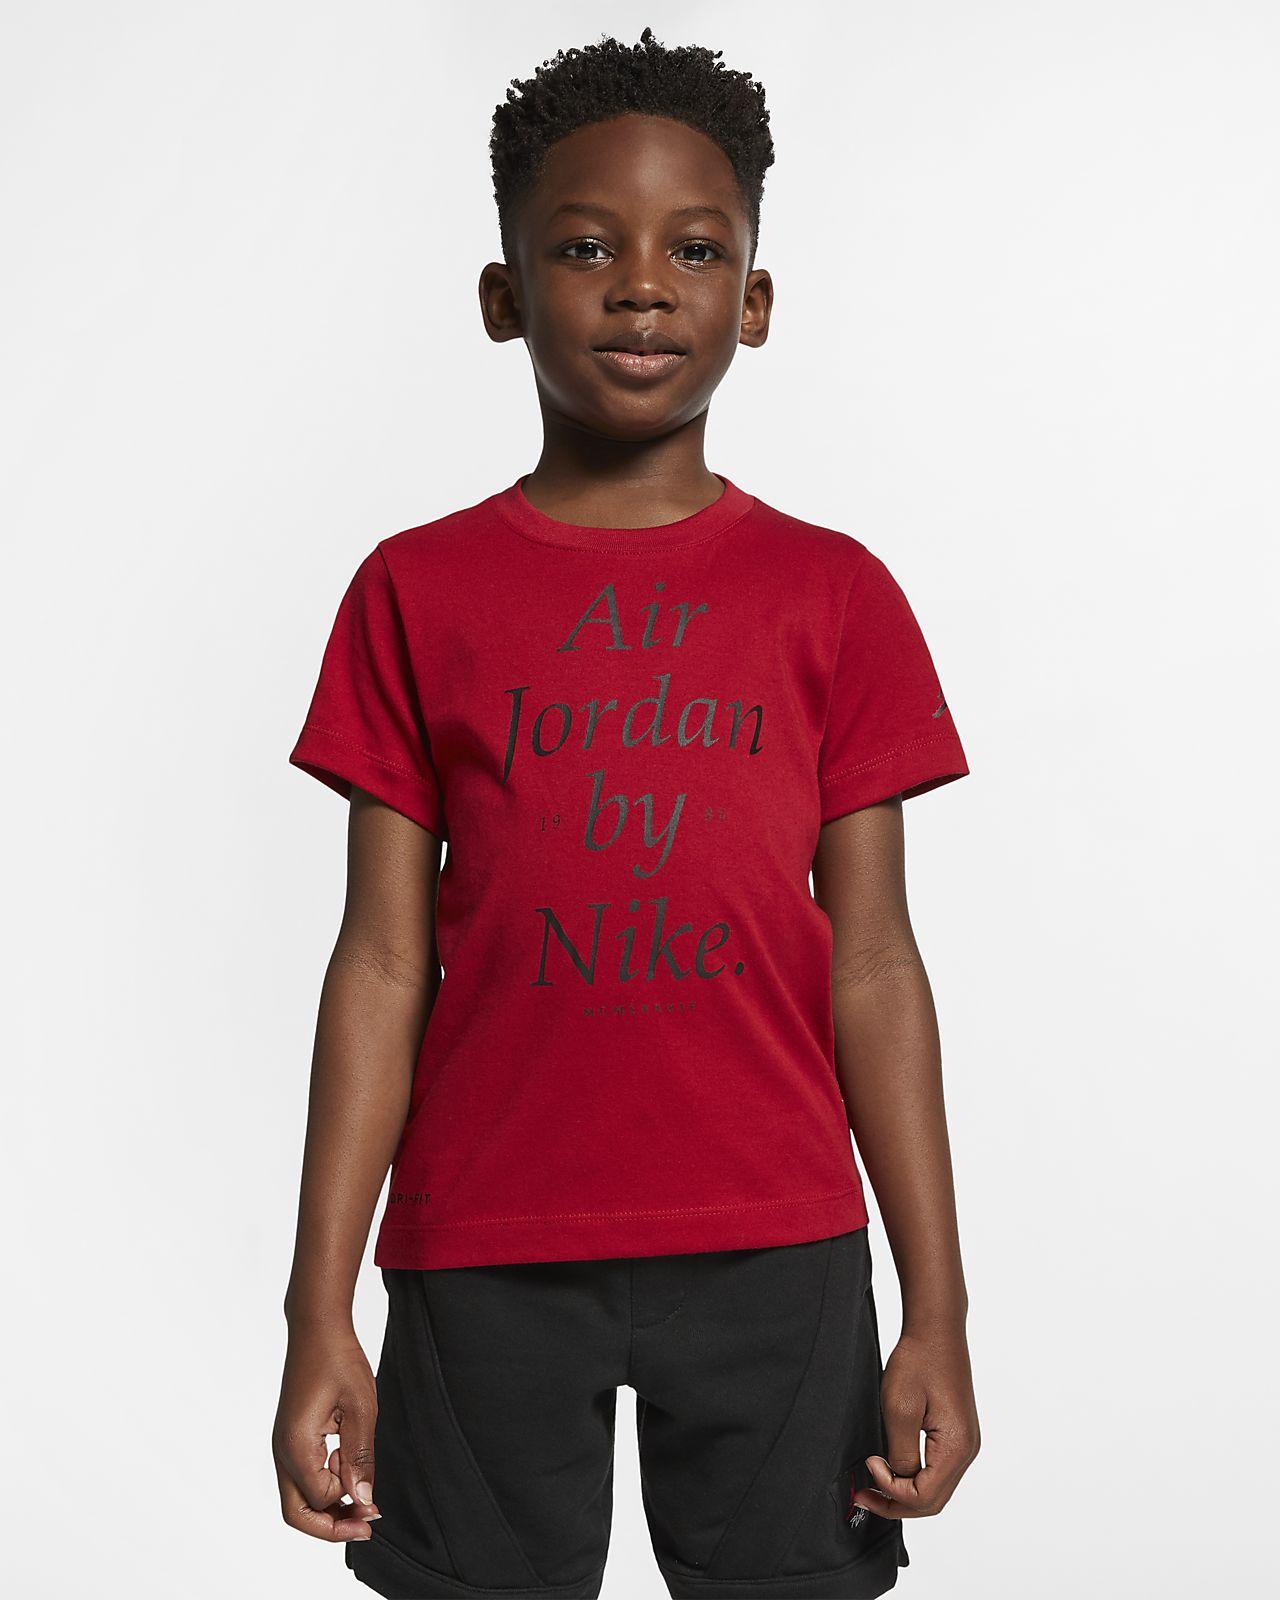 Jordan Sportswear-T-shirt til små børn